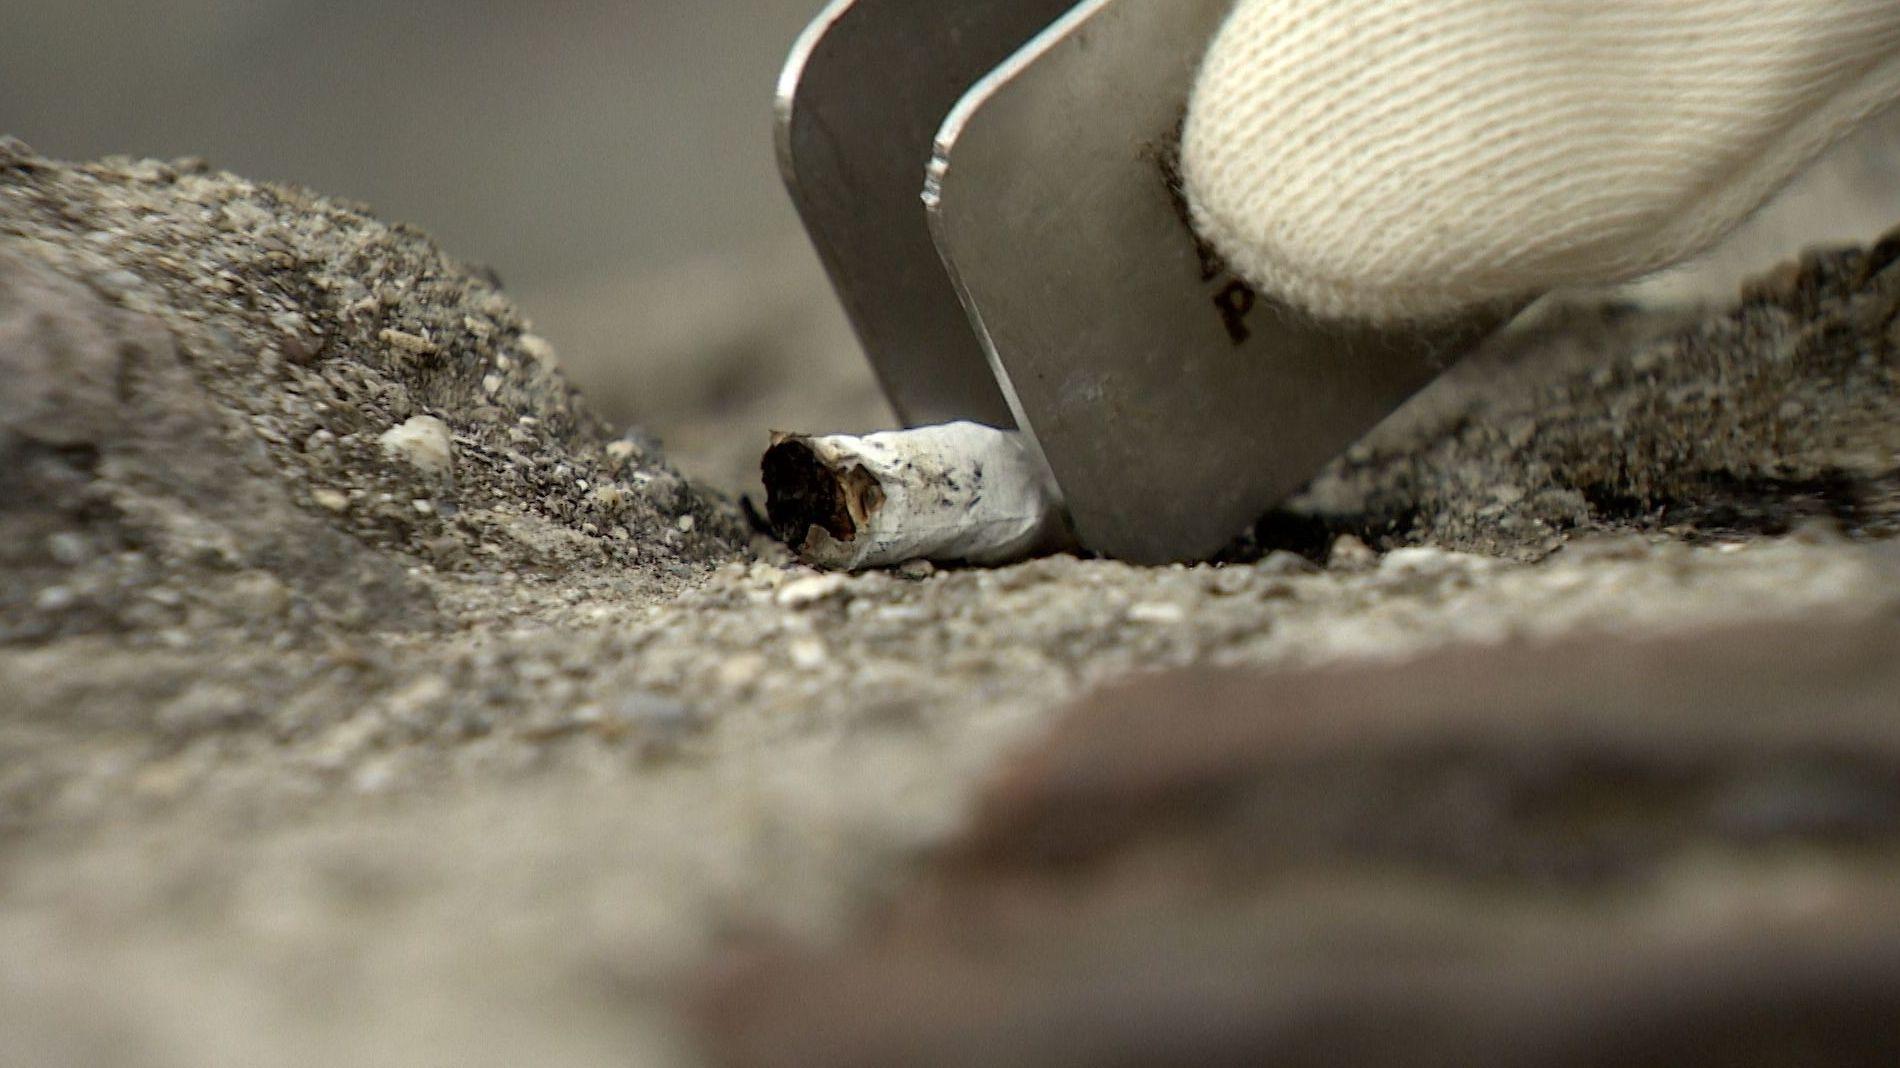 Auch Zigaretten-Kippen werden entsorgt